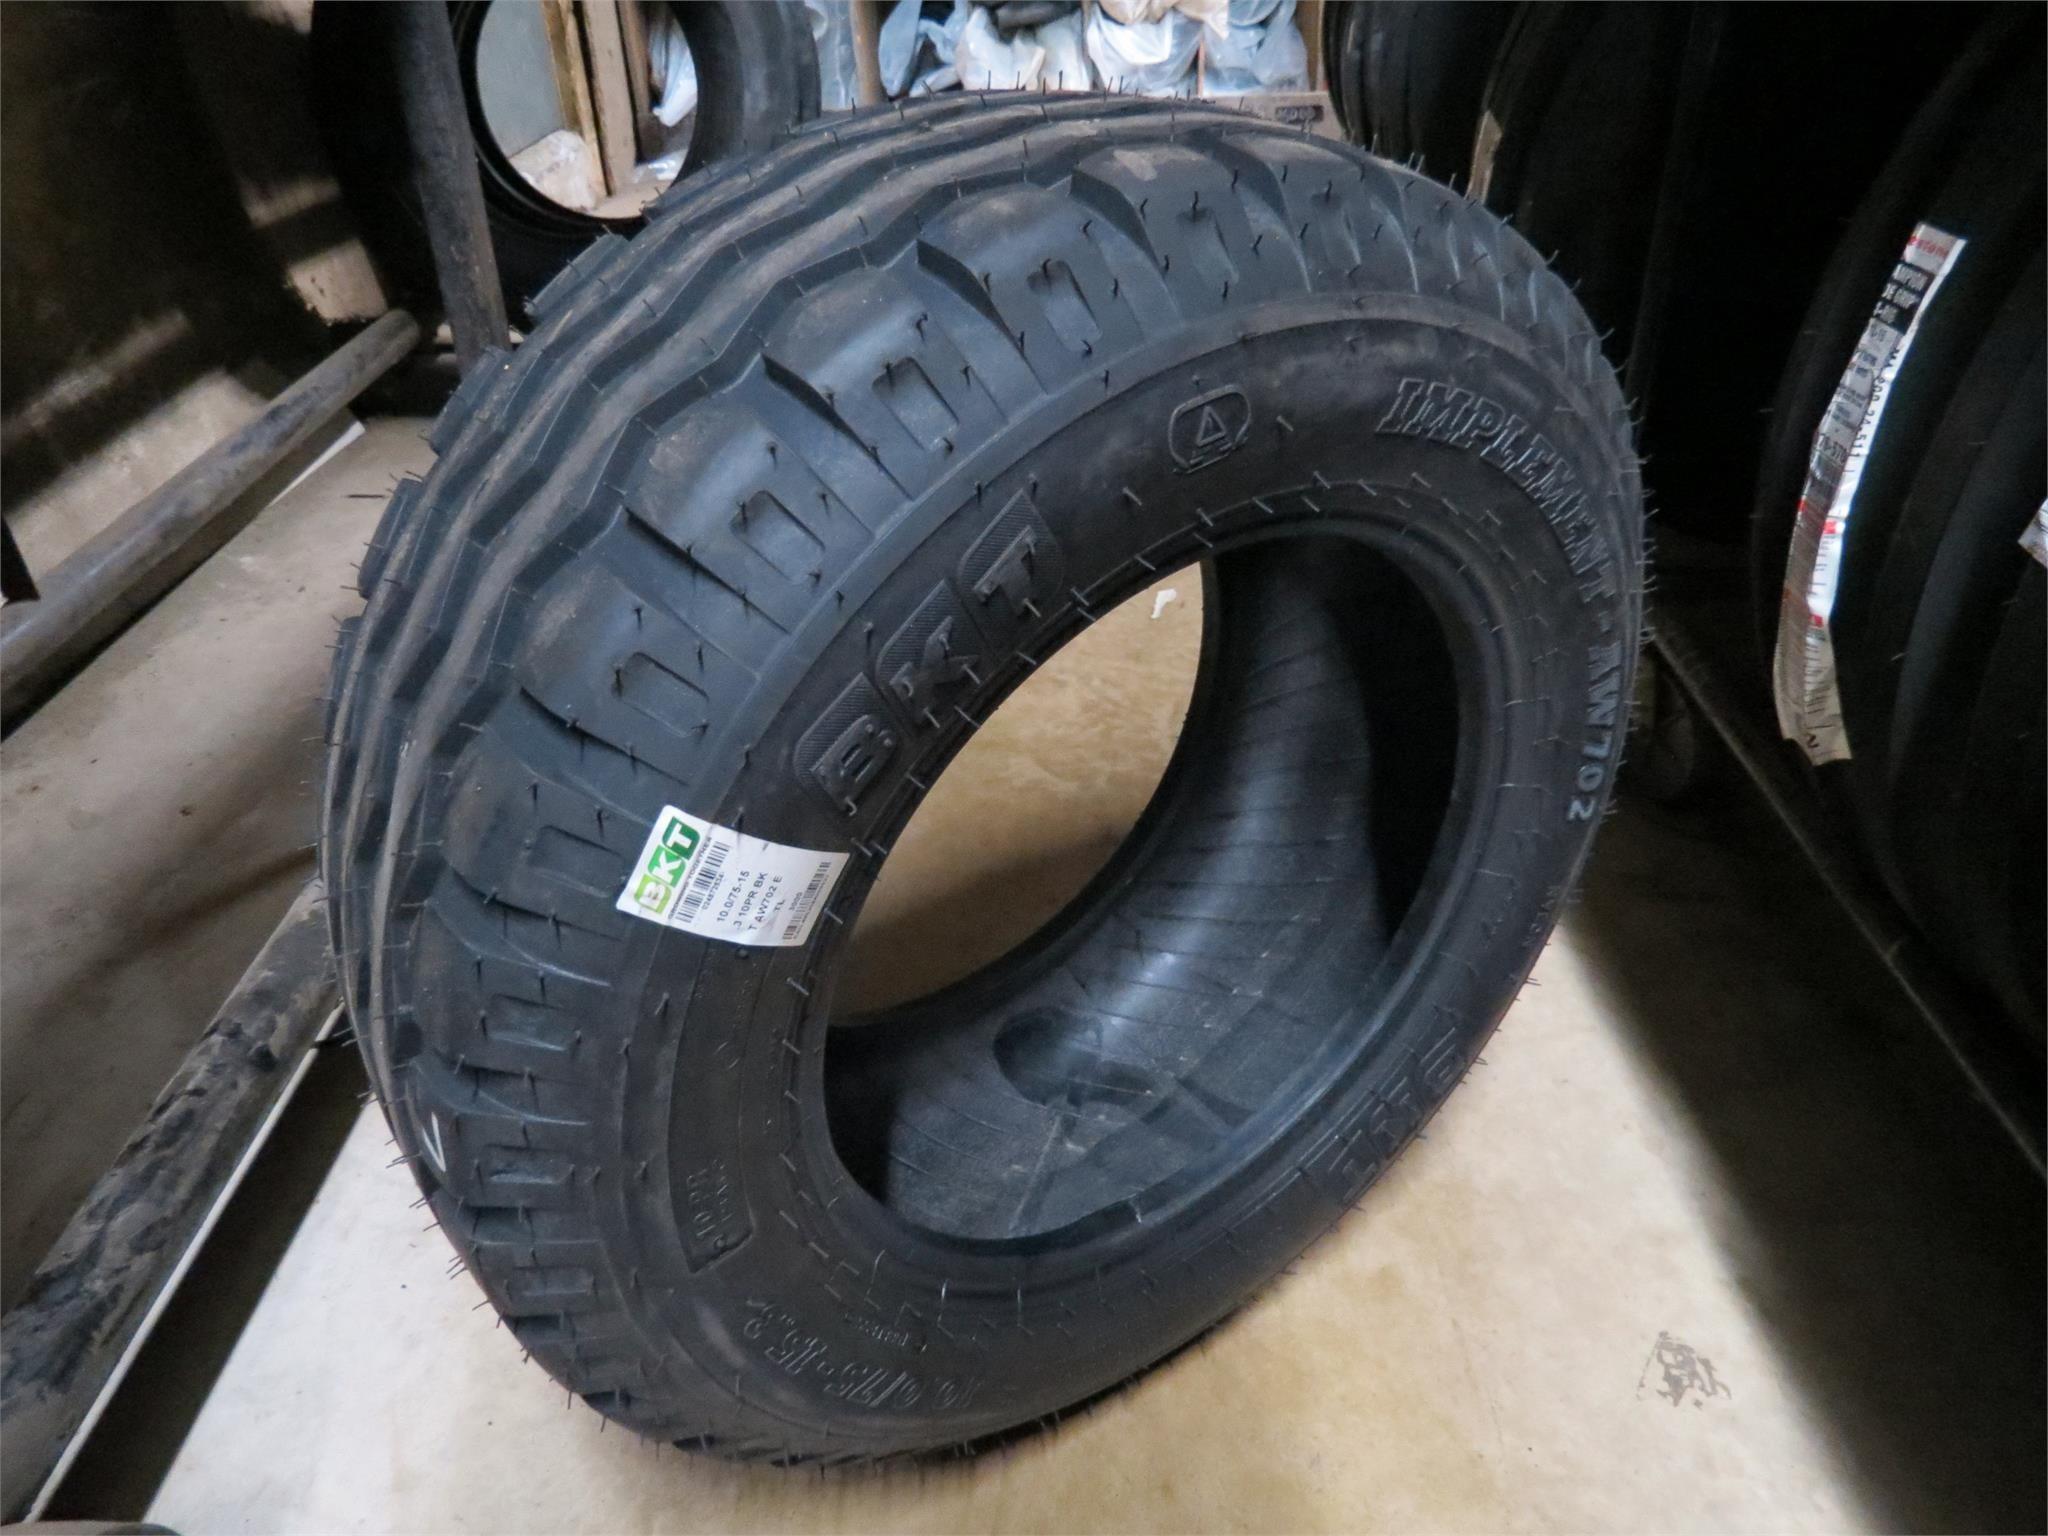 BKT 10.0/75-15.3 Wheels / Tires / Track